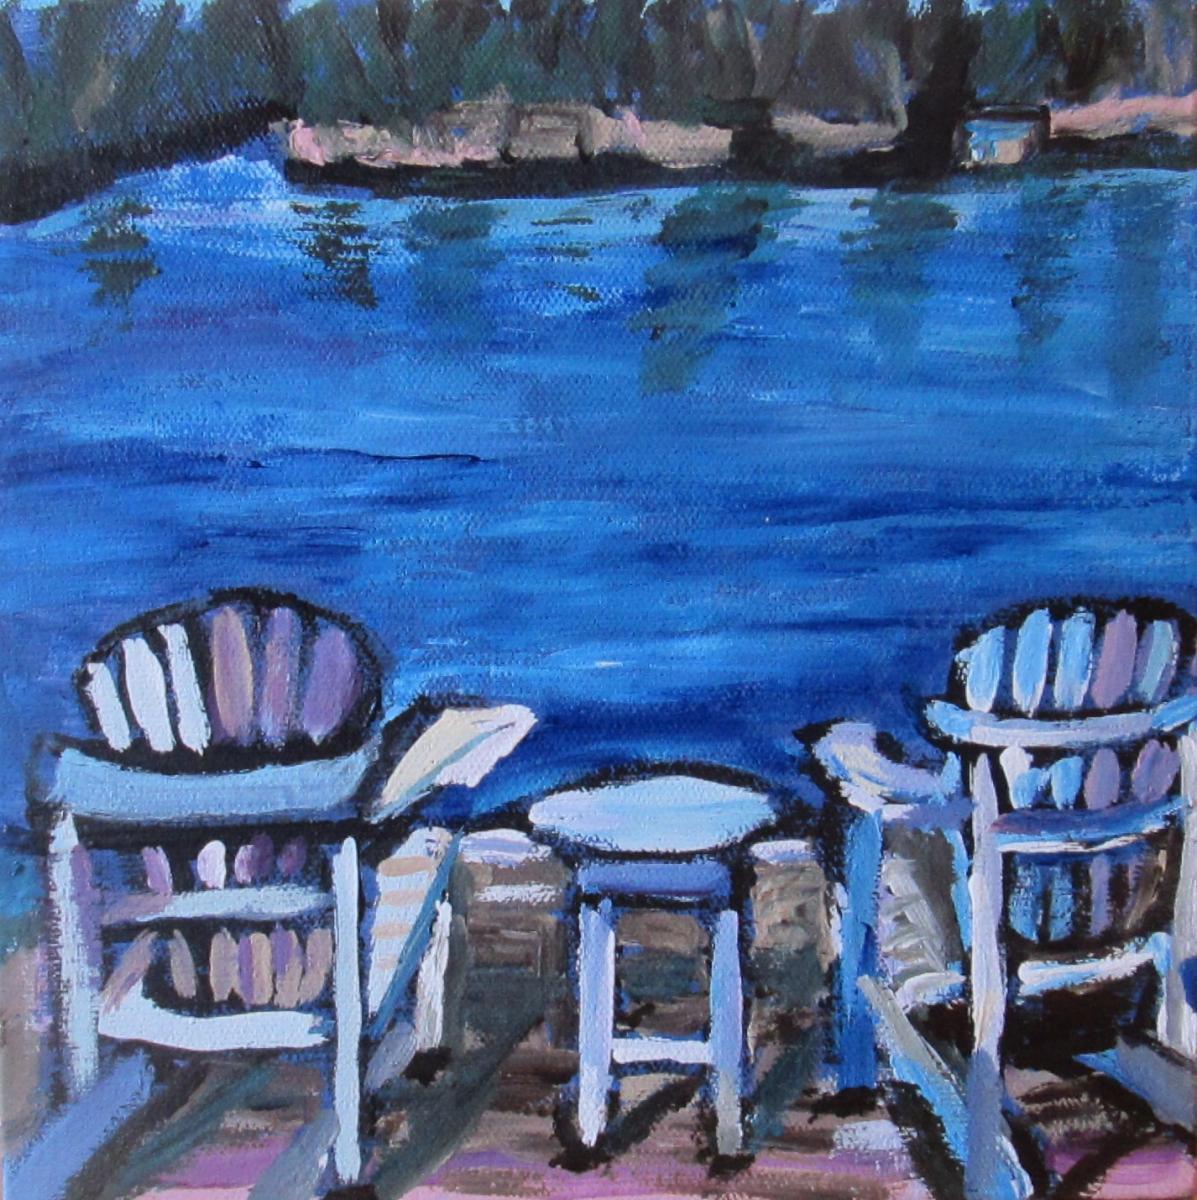 Relaxing in Muskoka, acrylic on canvas, 8x8, $90